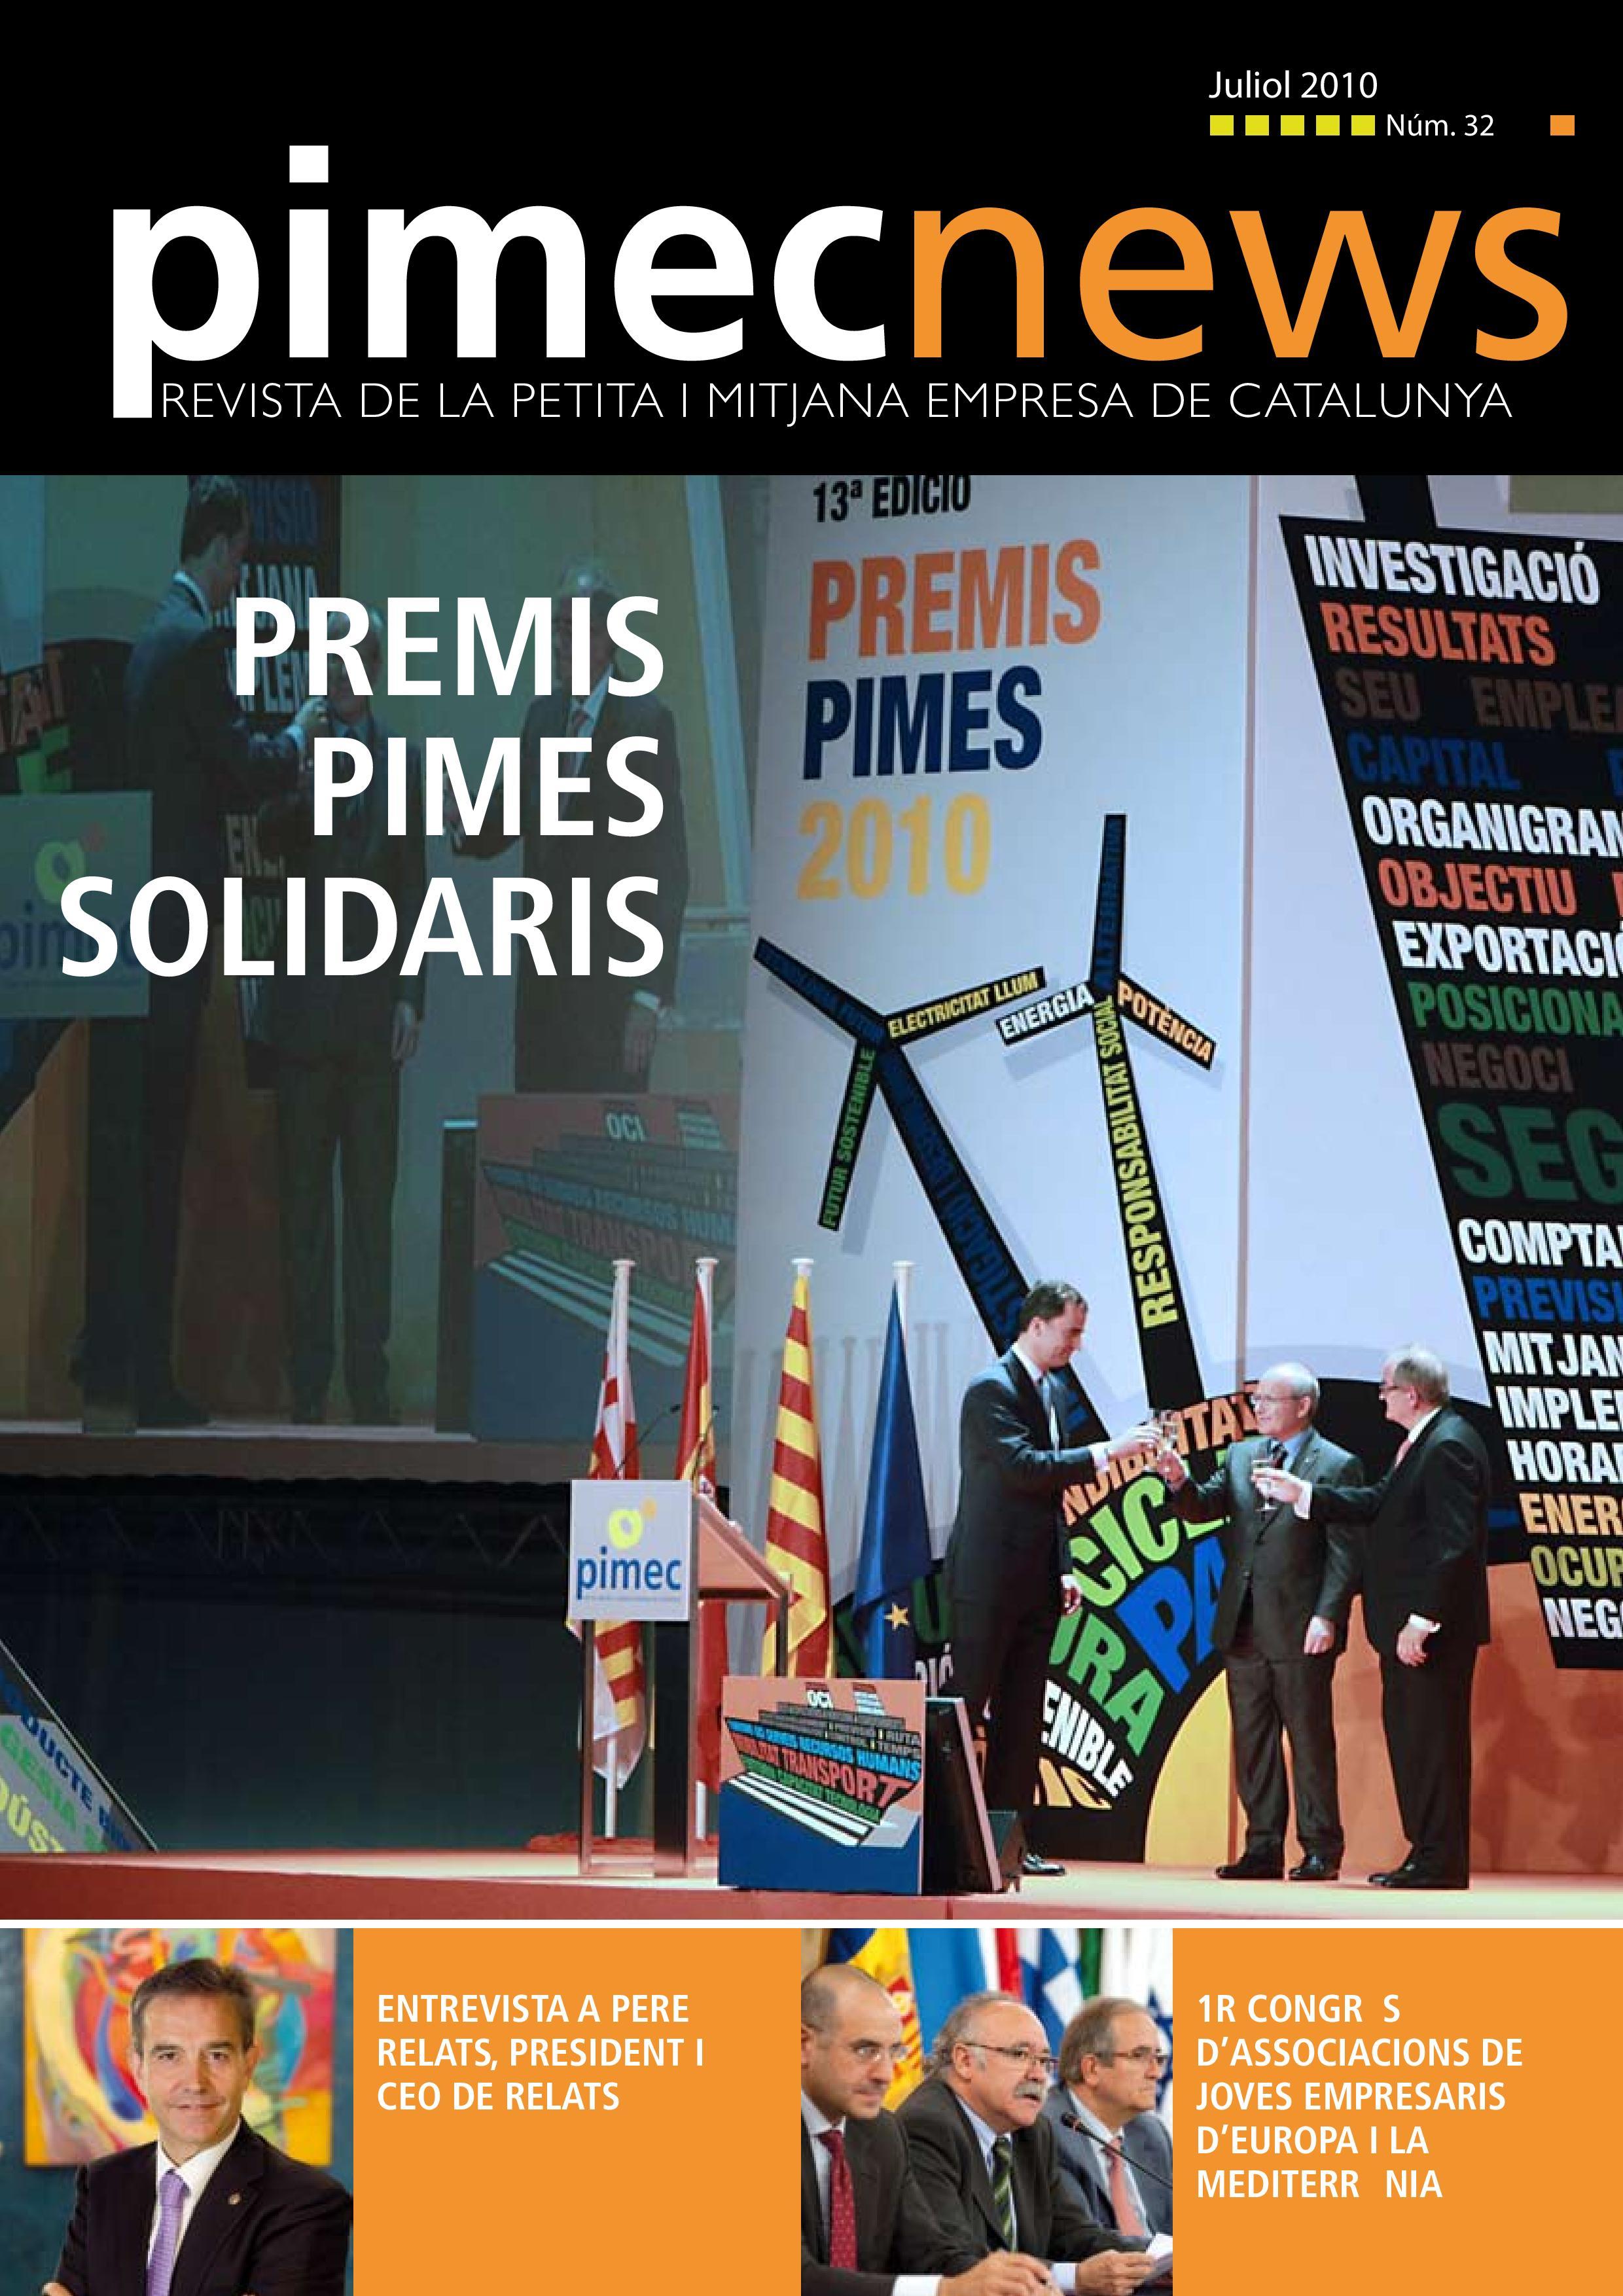 PIMEC News #32